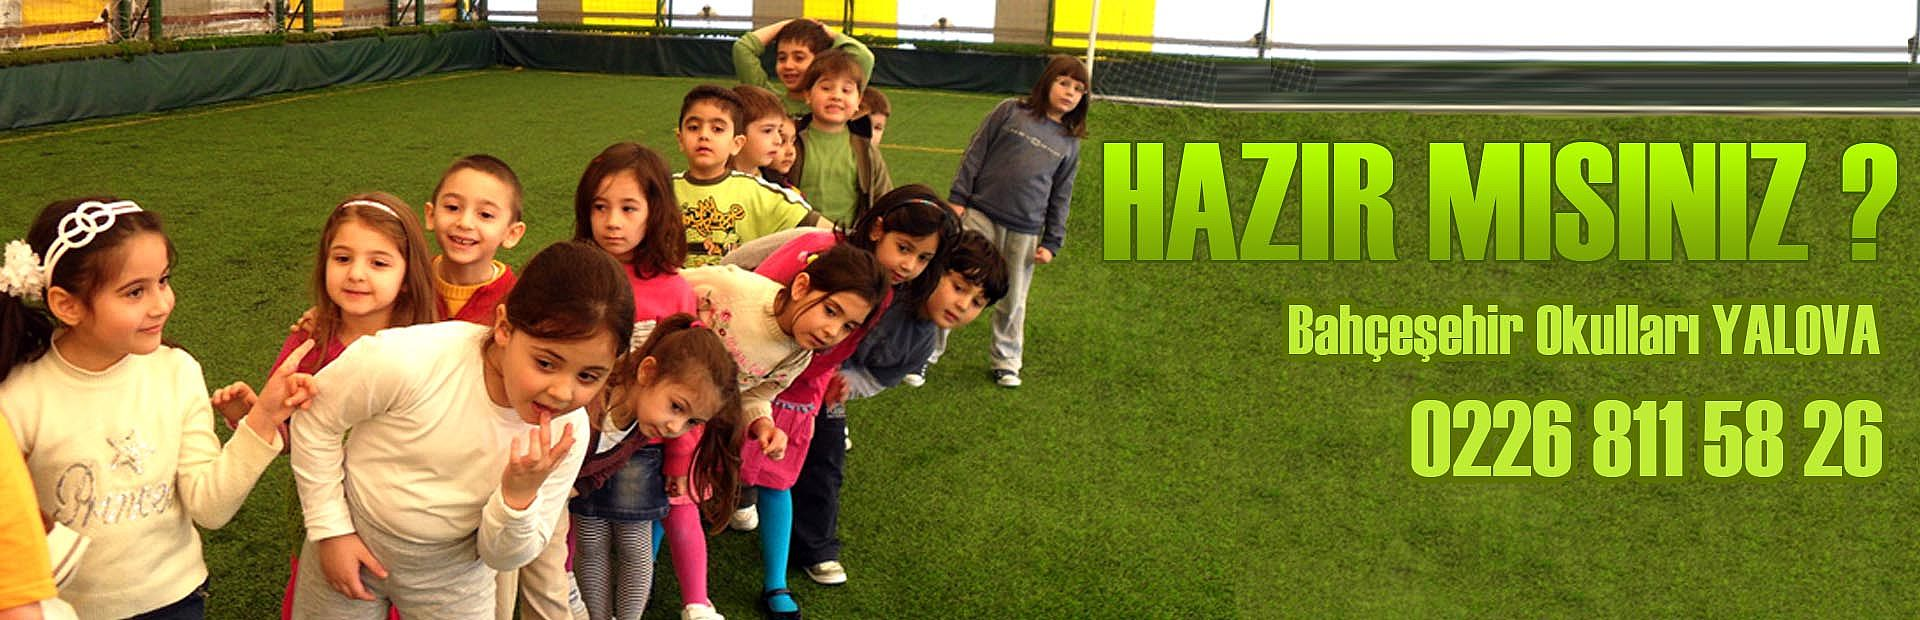 Yalova Bahçeşehir Koleji Ajanda Servisi